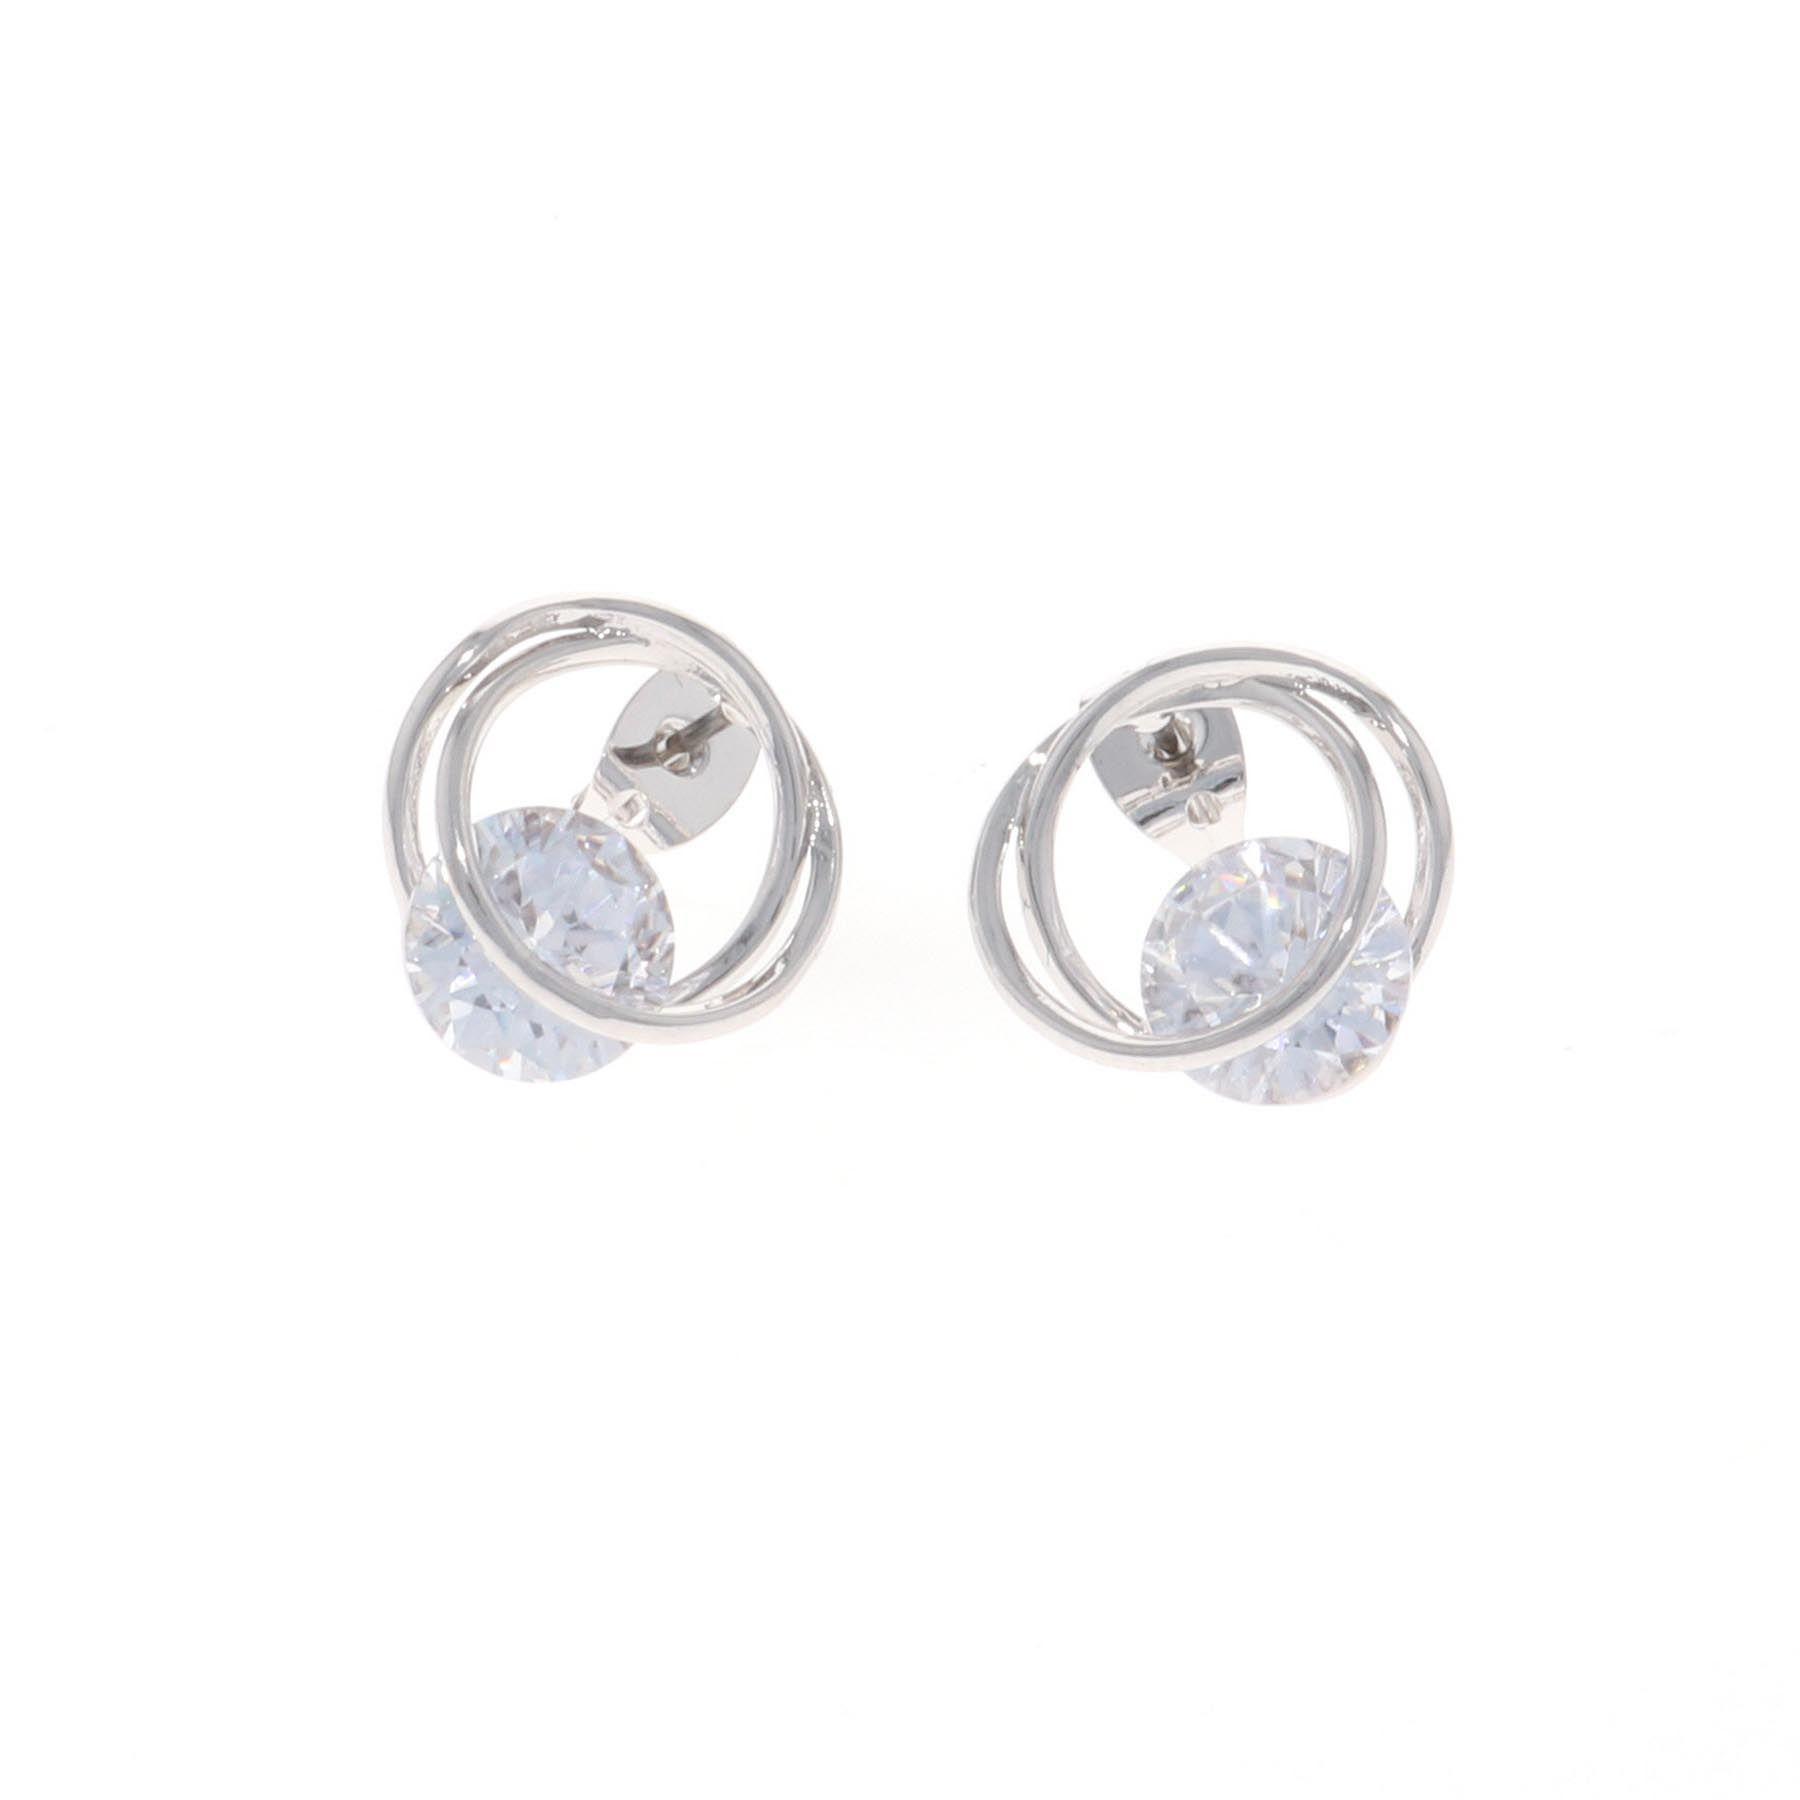 Twisting Hold Post Earrings